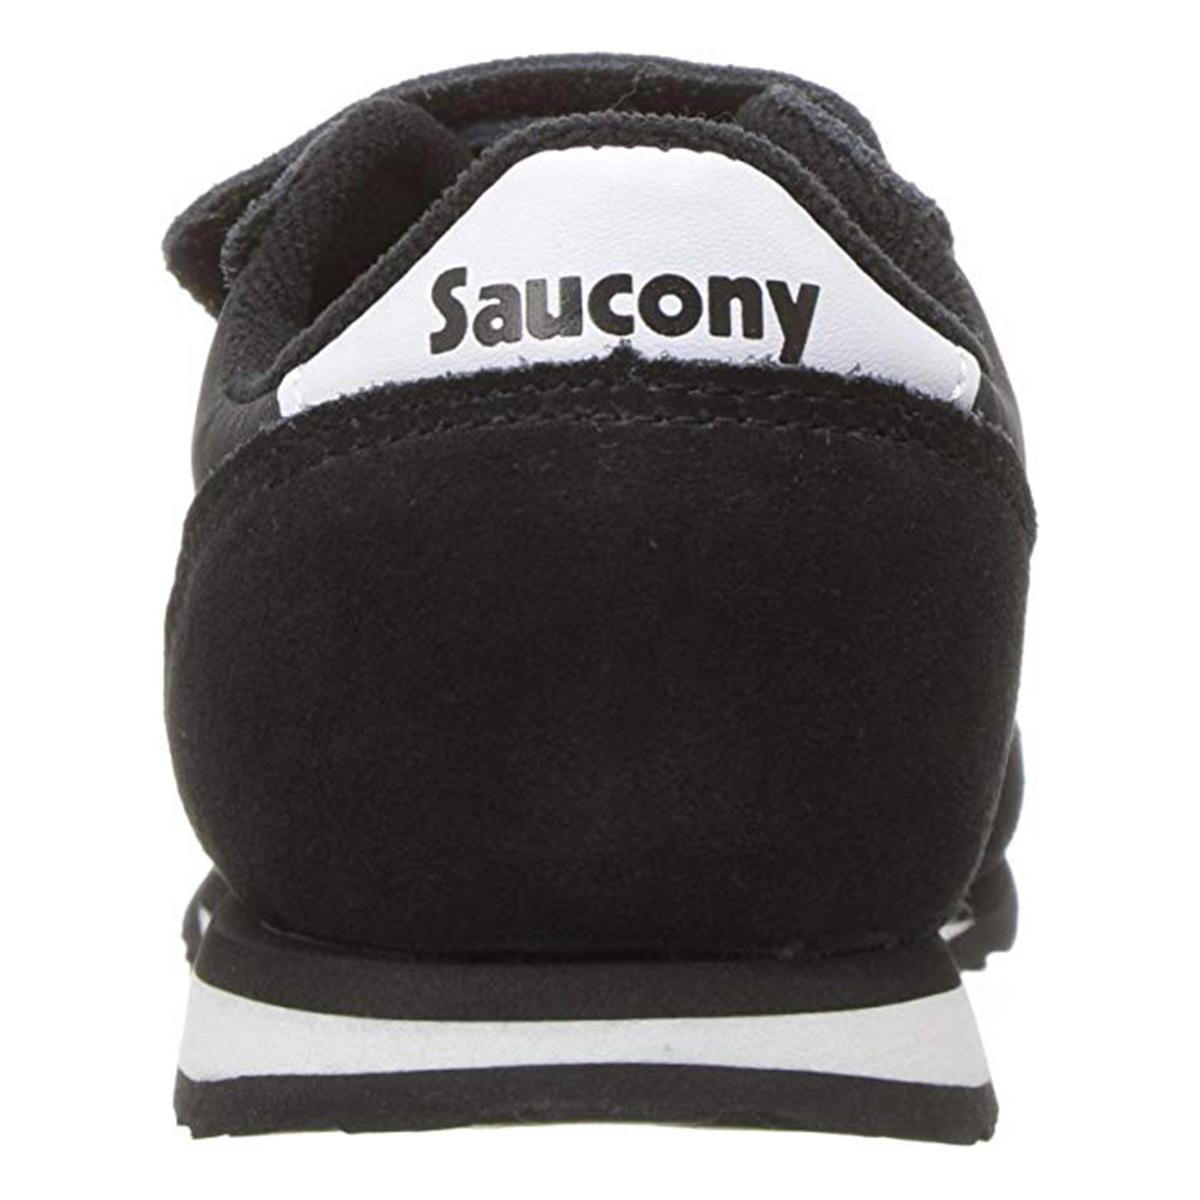 Scarpe Saucony Baby Jazz HL Black/white bambino unisex rif.SL260379